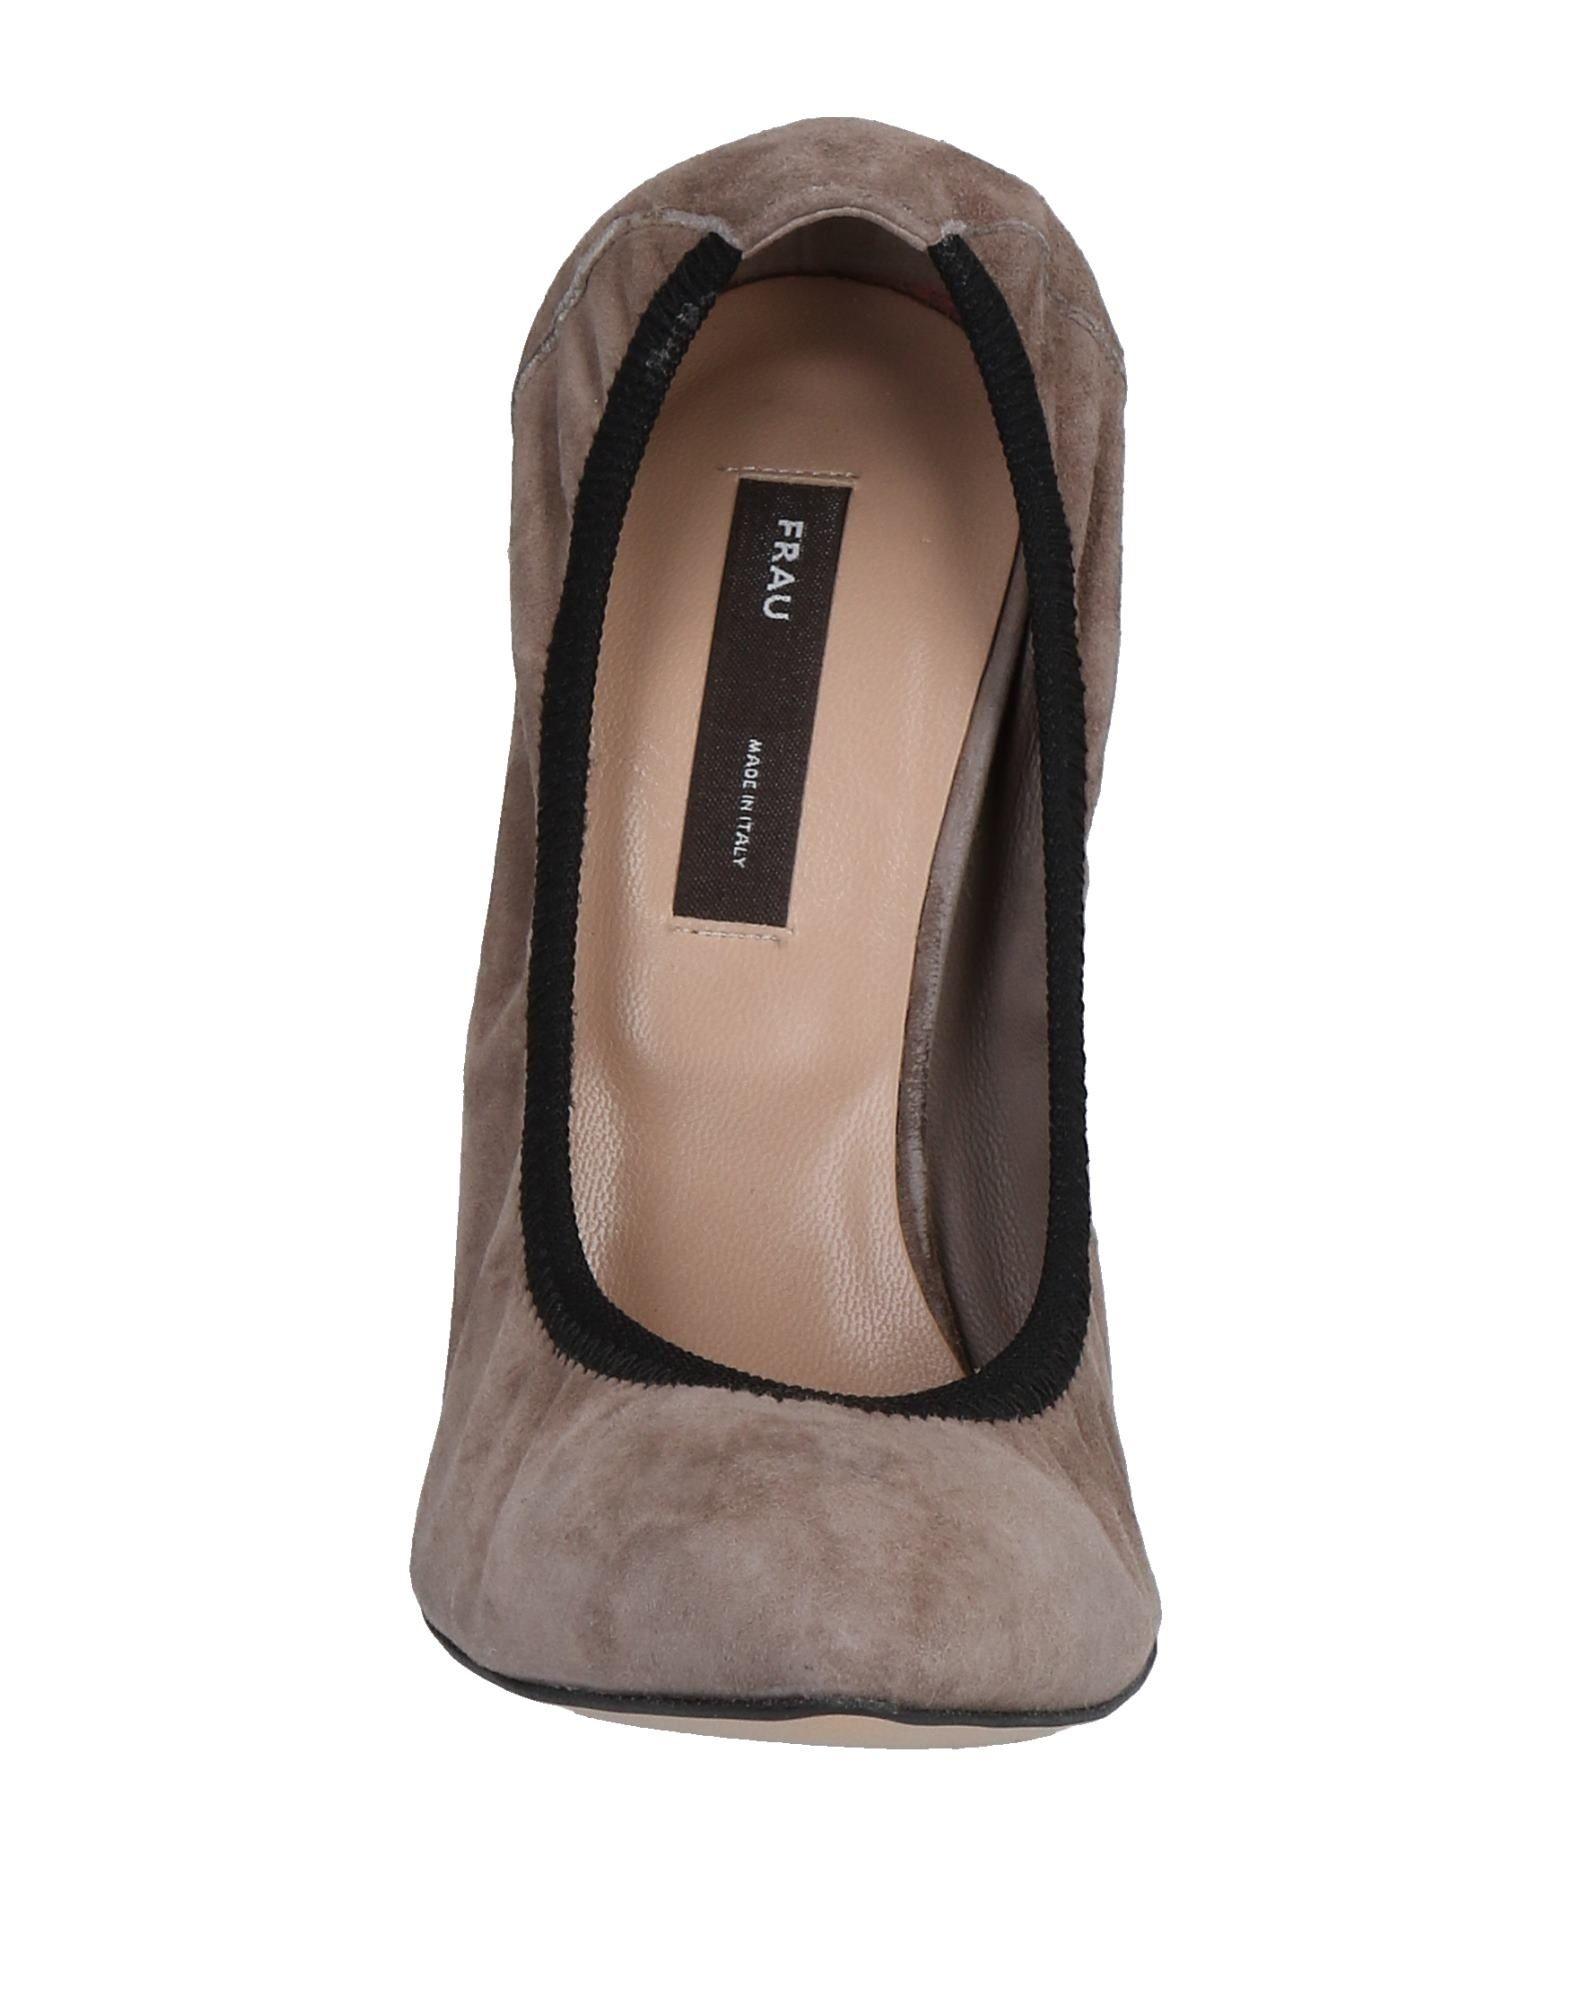 Frau Gute Pumps Damen  11480582MN Gute Frau Qualität beliebte Schuhe 9a2379